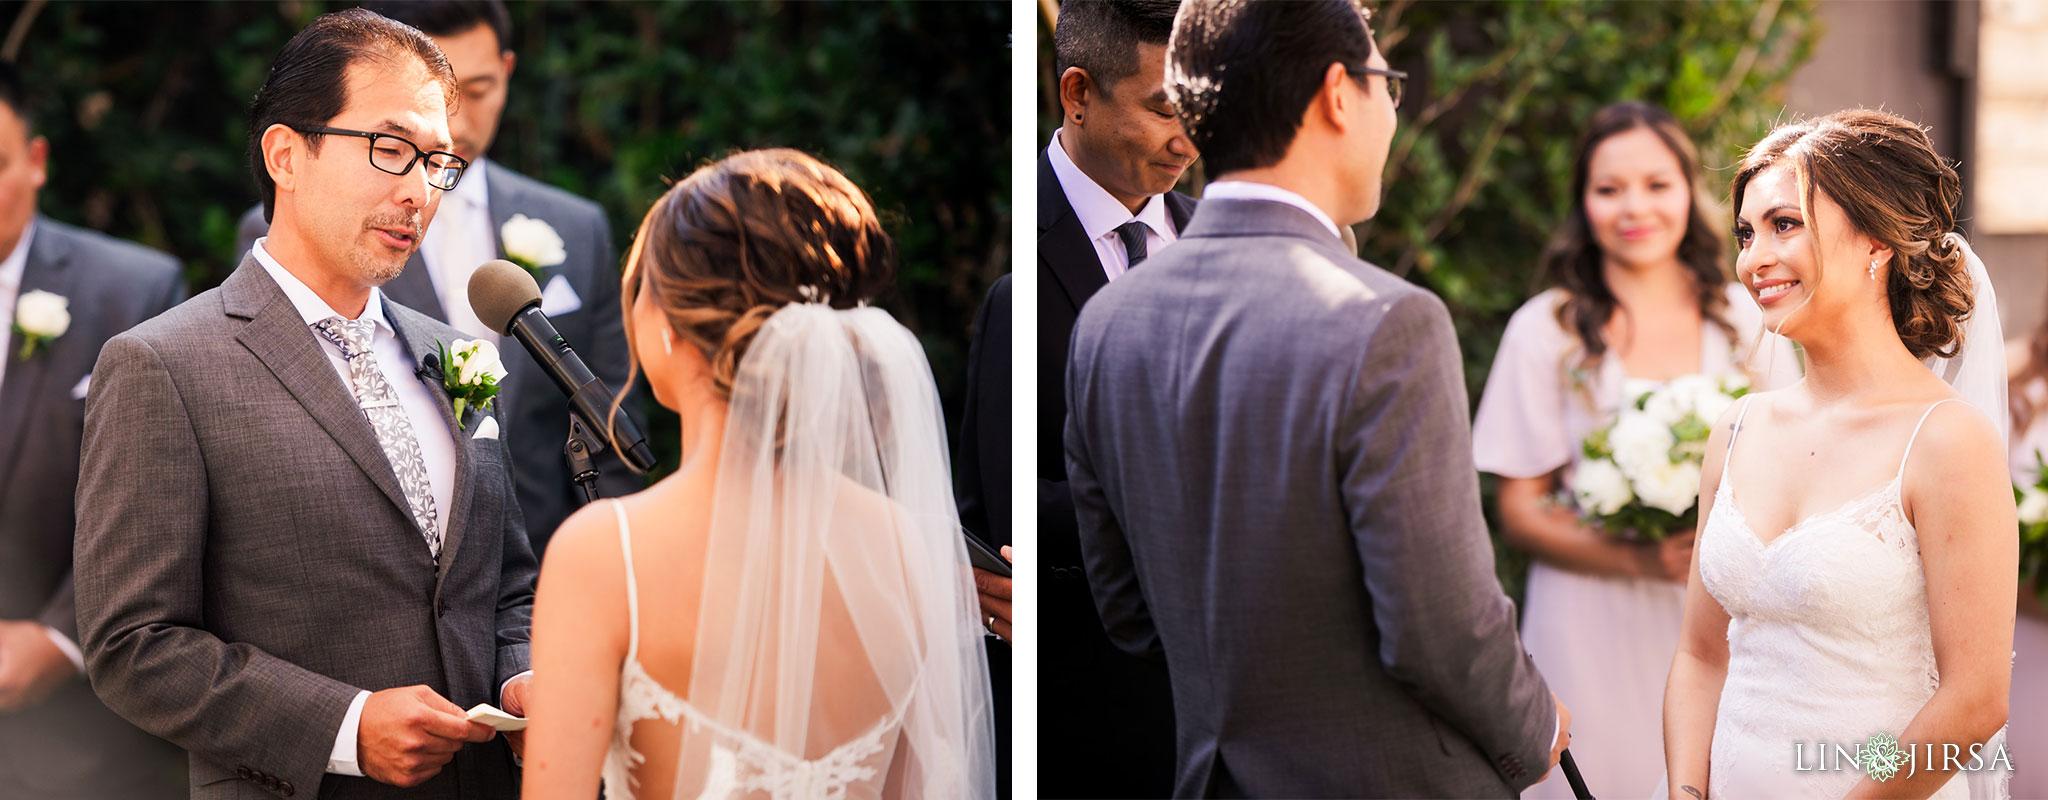 021 york manor los angeles wedding ceremony photography